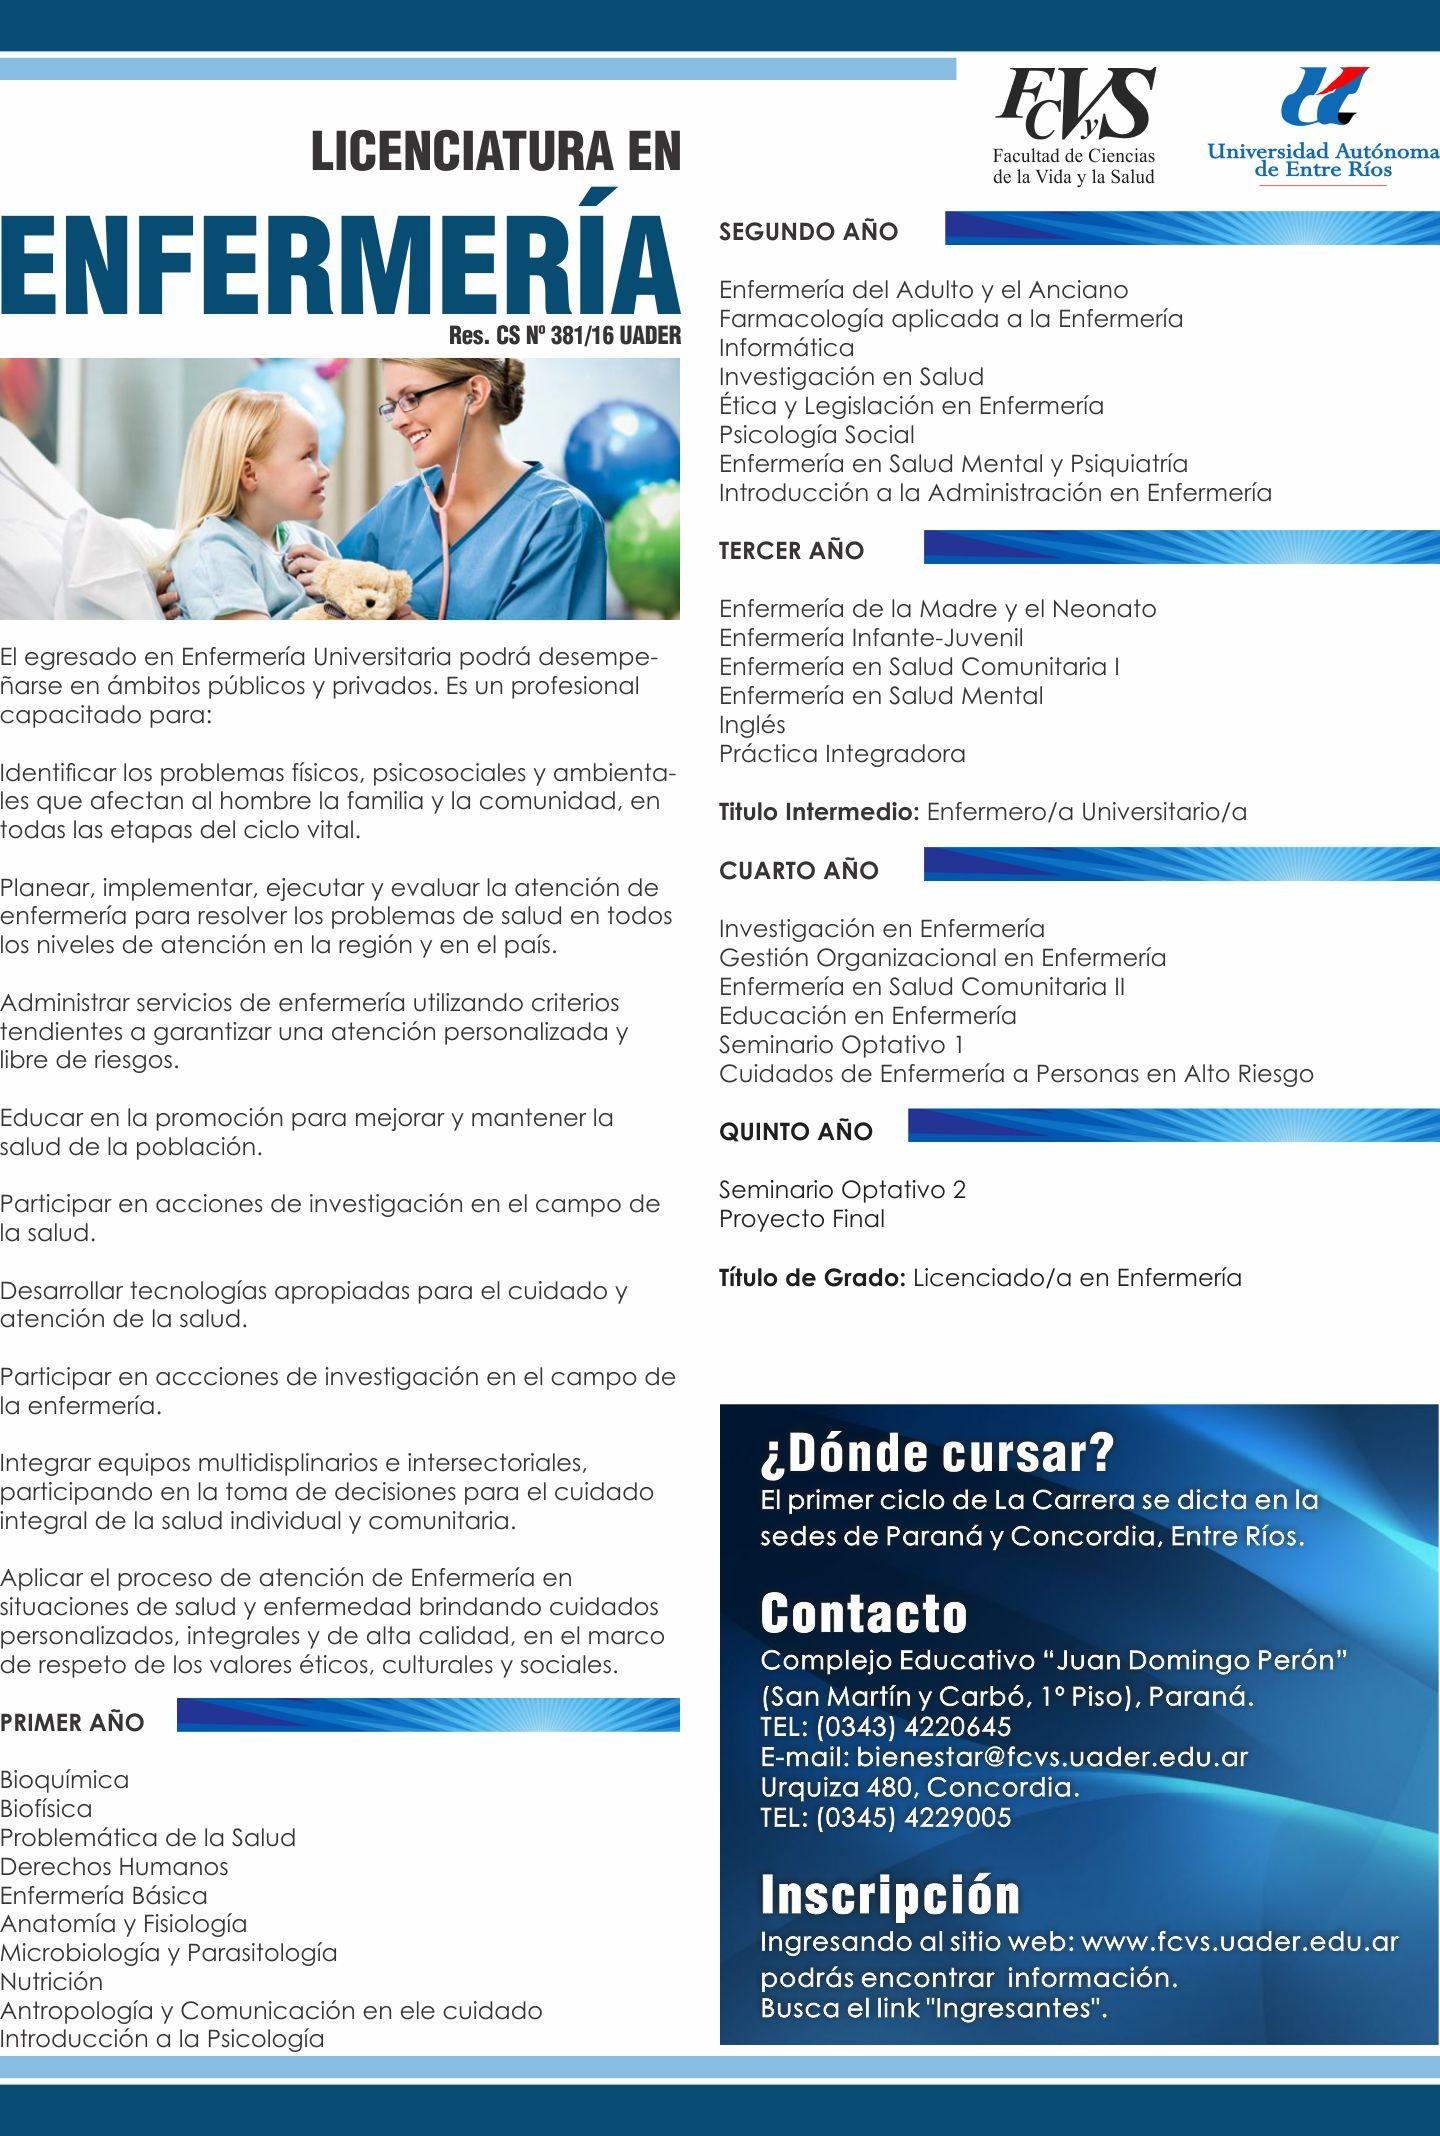 Enfermera Universitaria